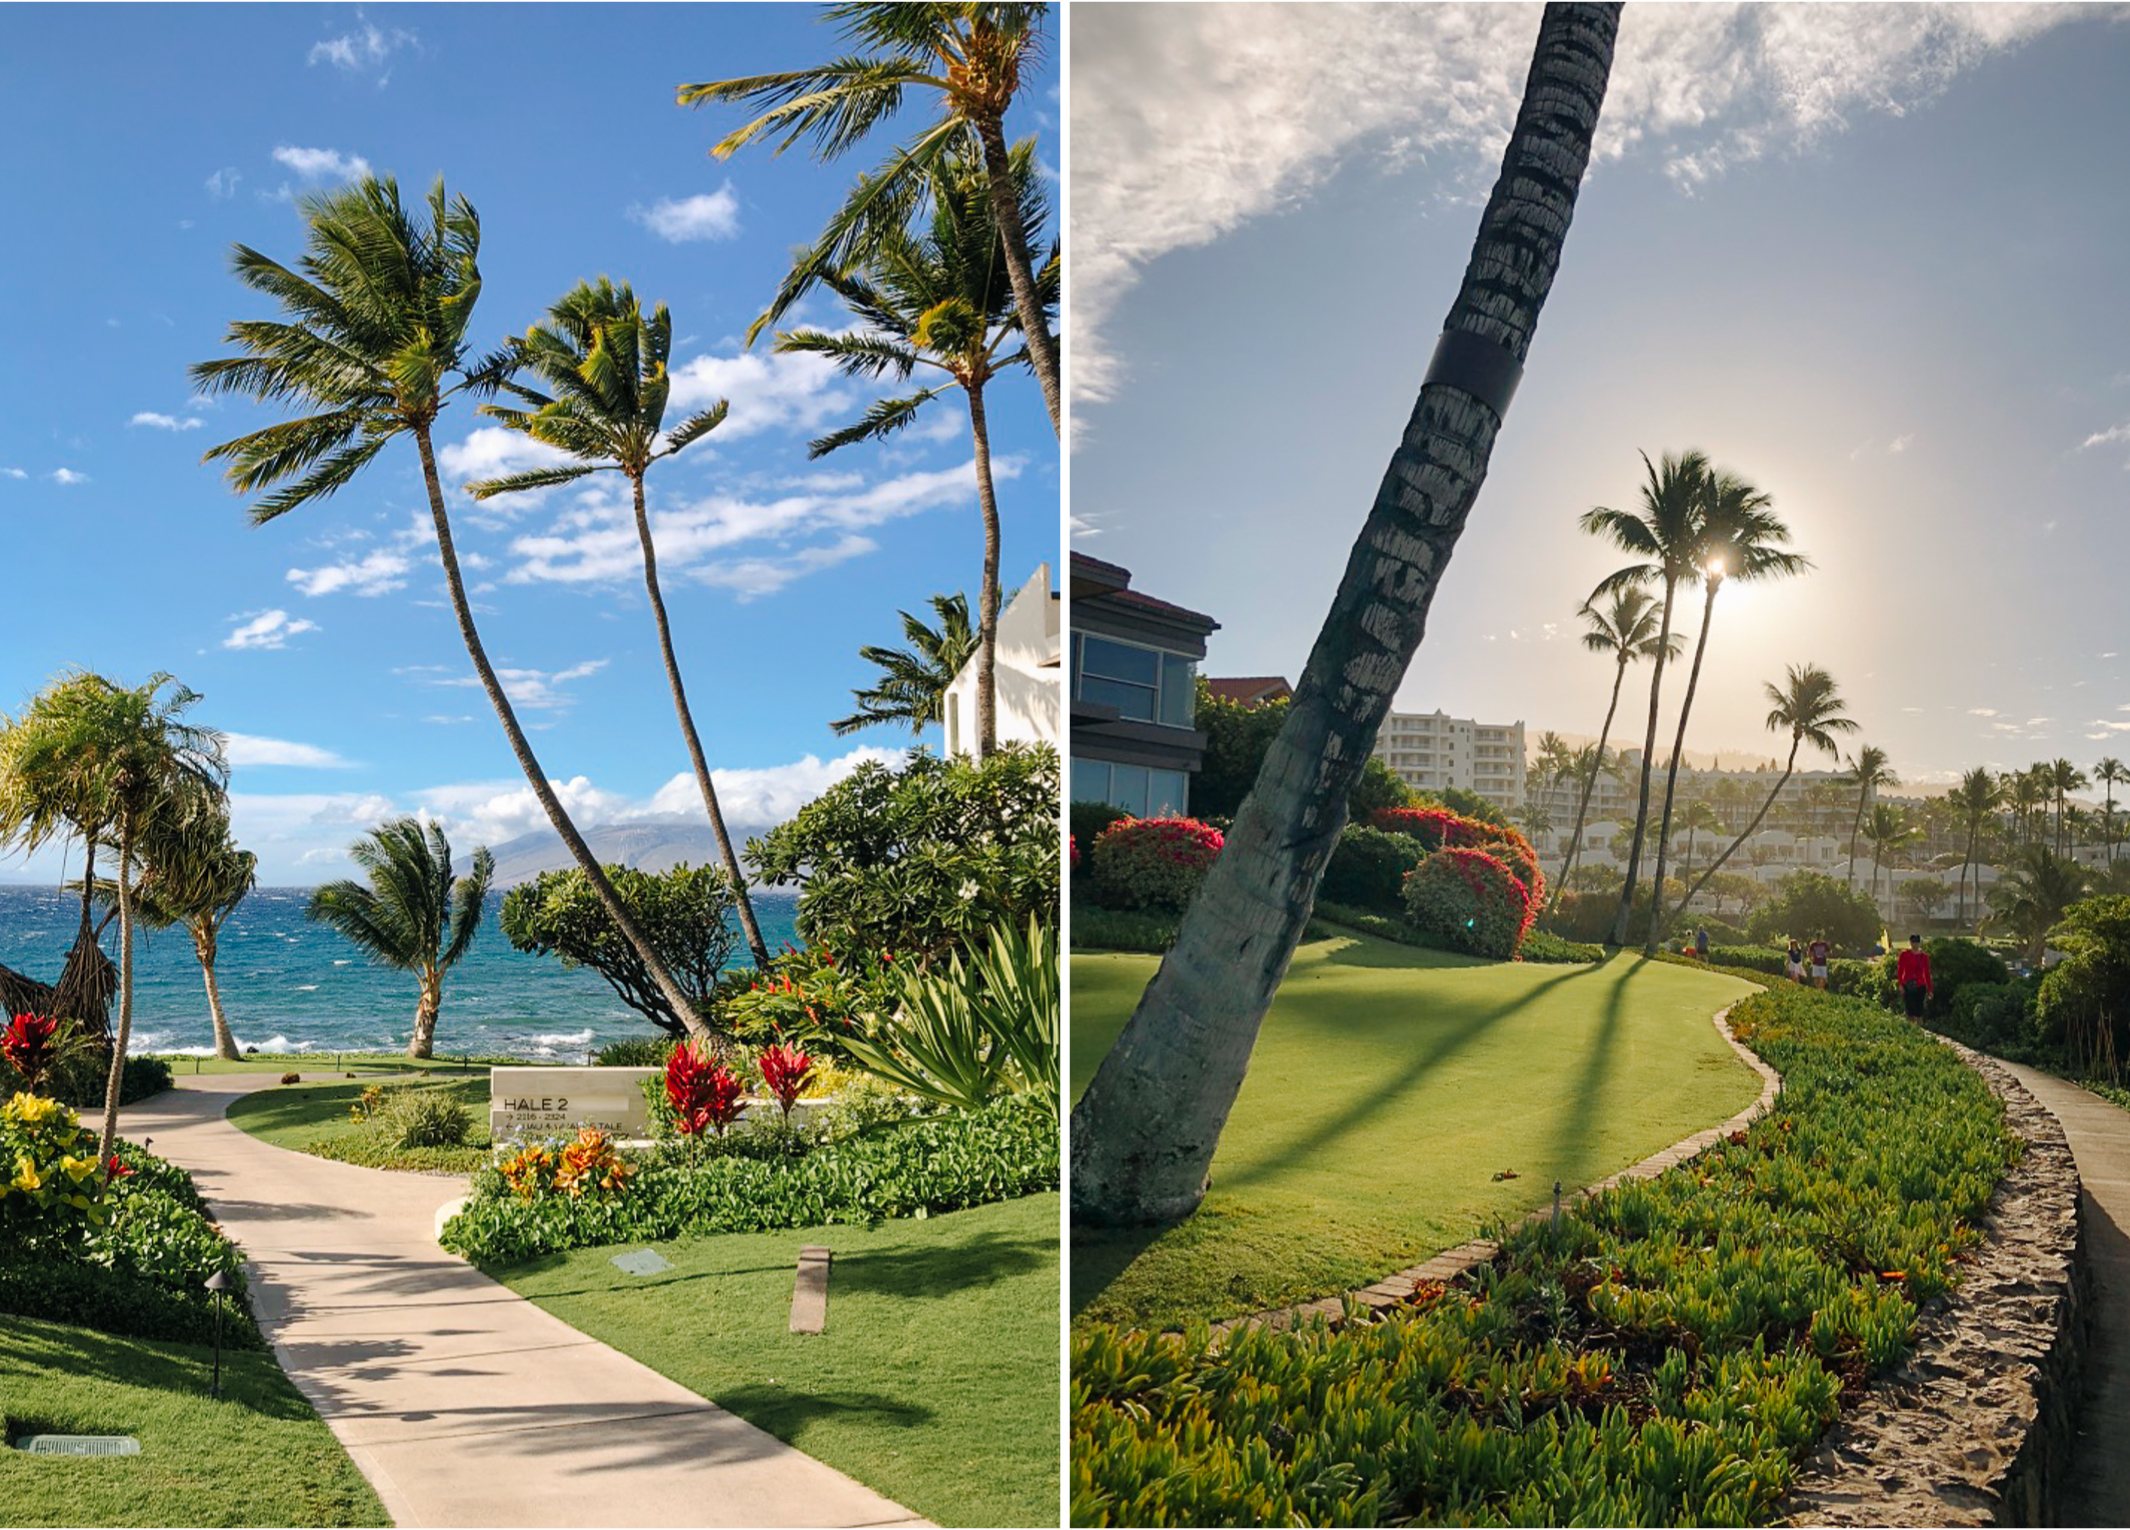 Hawaii_Maui_Dragana_P-13.jpg